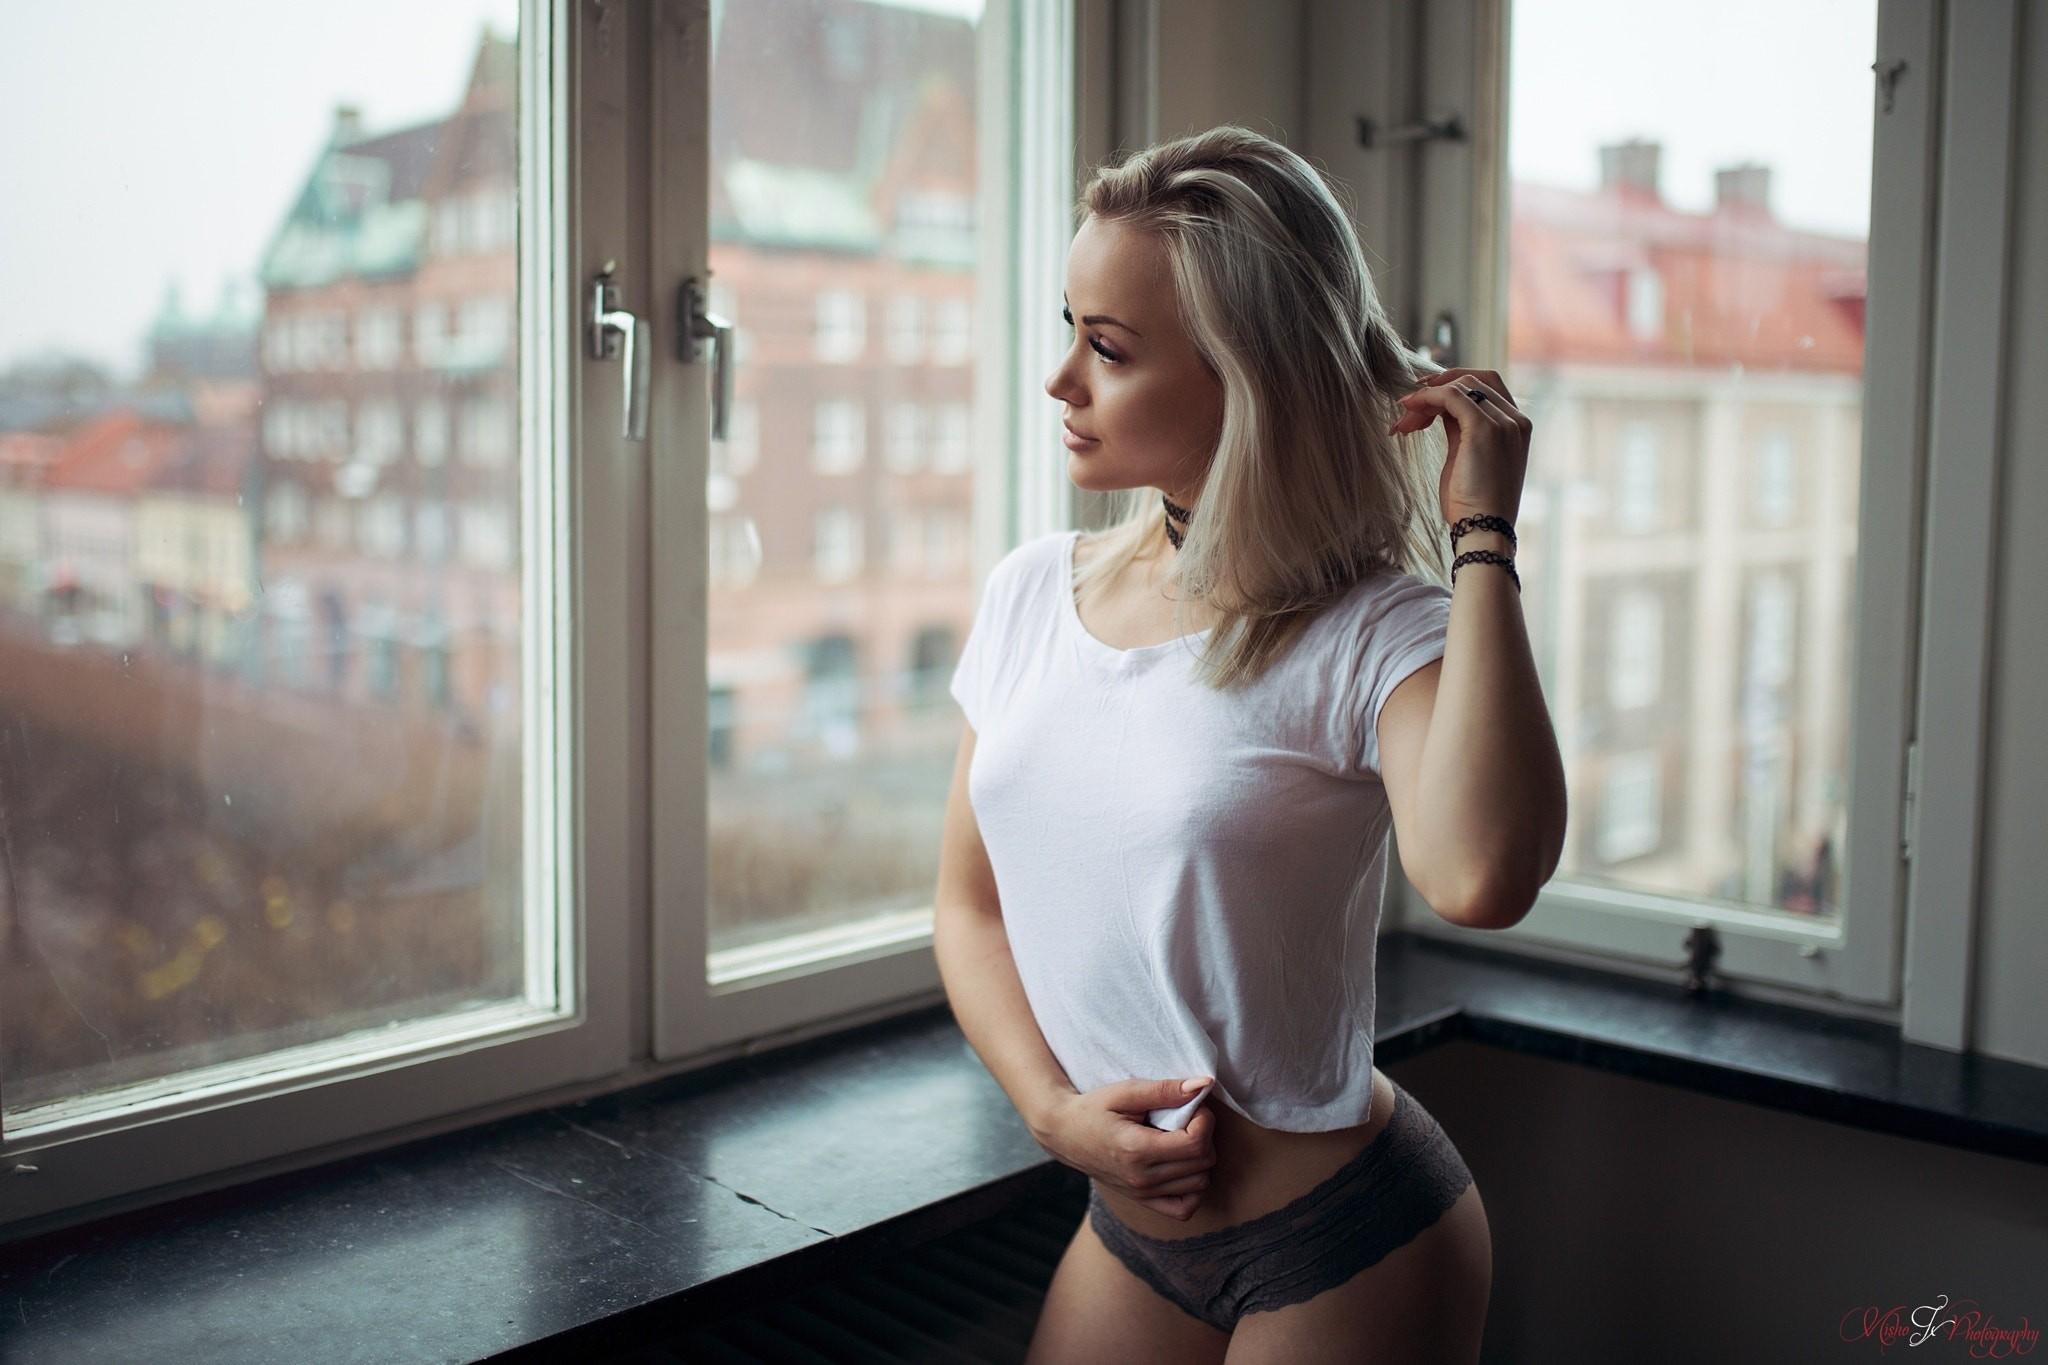 wallpaper : women, model, blonde, t shirt, window, choker, brunette